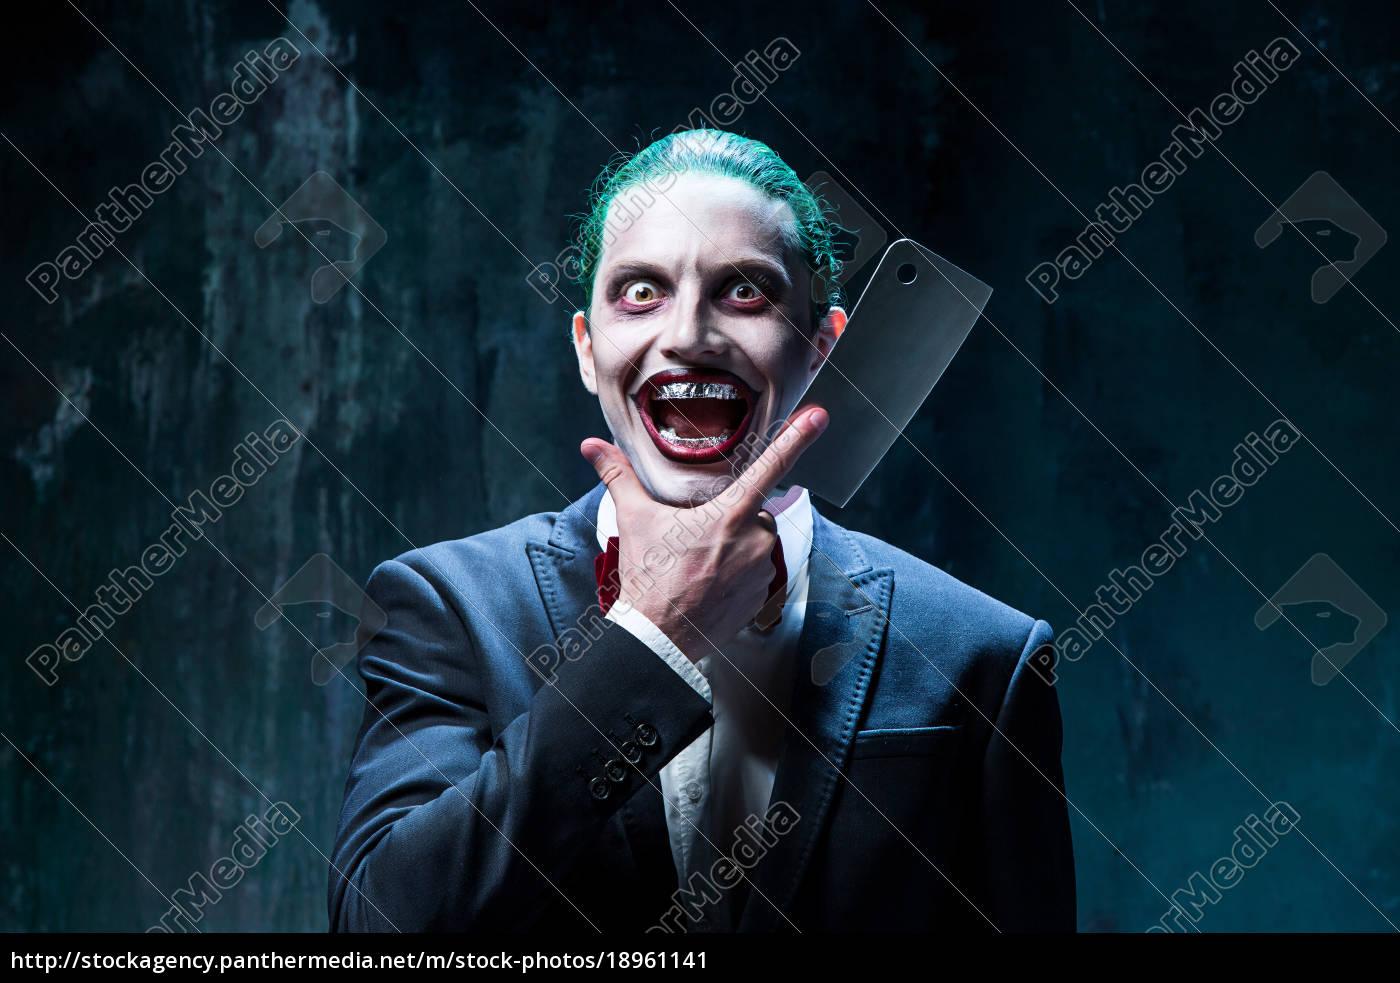 Halloween Thema.Lizenzfreies Bild 18961141 Blutige Halloween Thema Verruckt Joker Gesicht